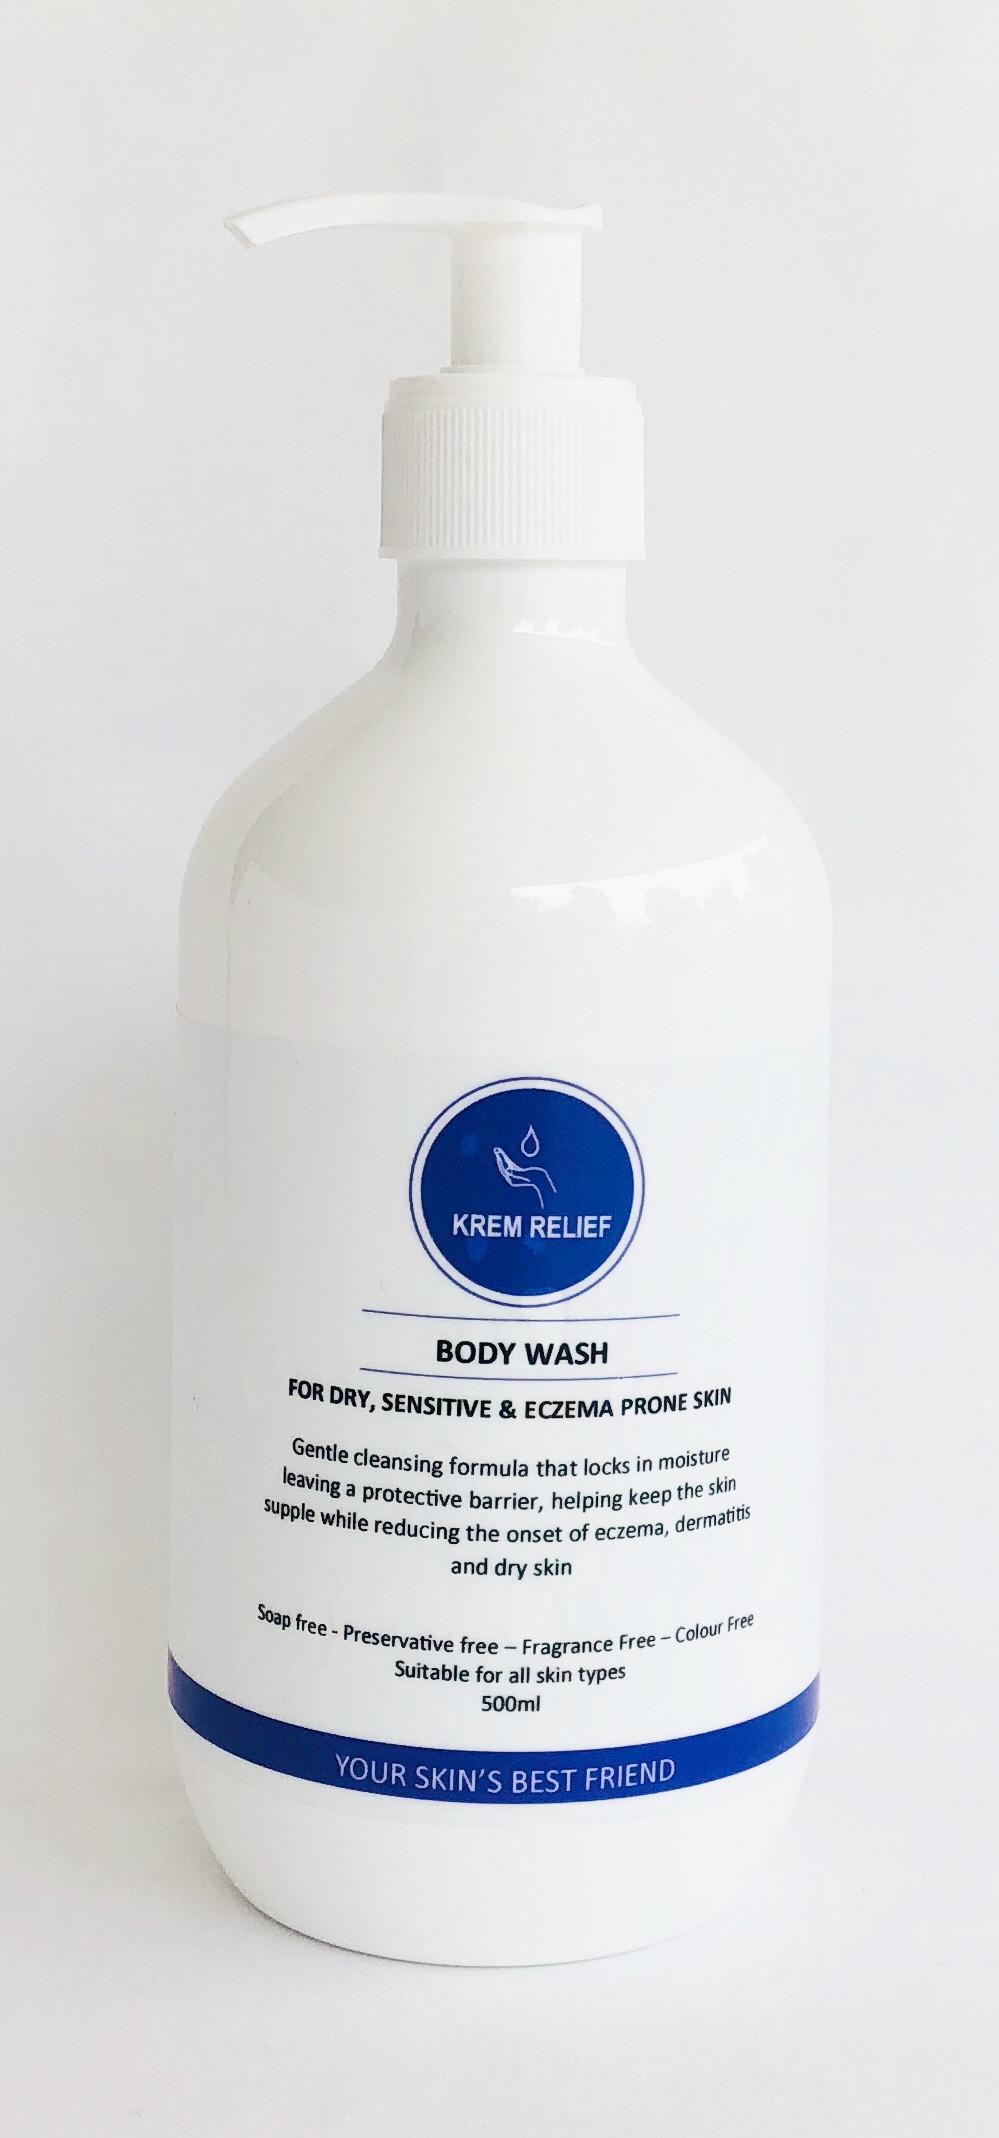 Krem Relief Body Wash